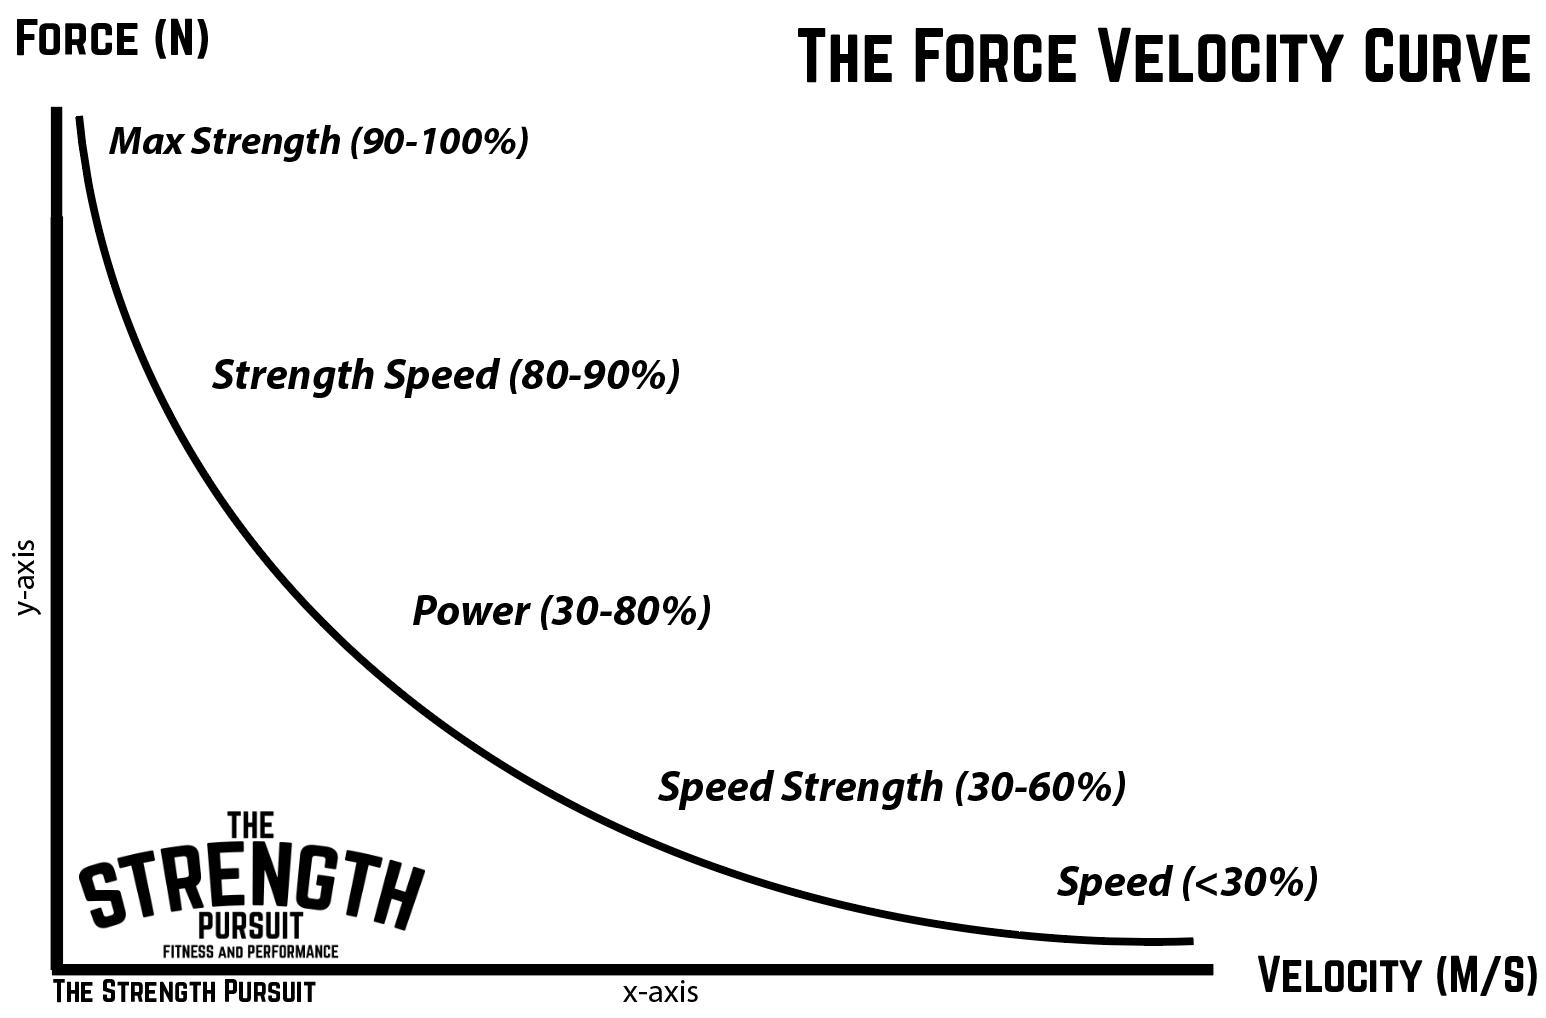 Force Velocity curve